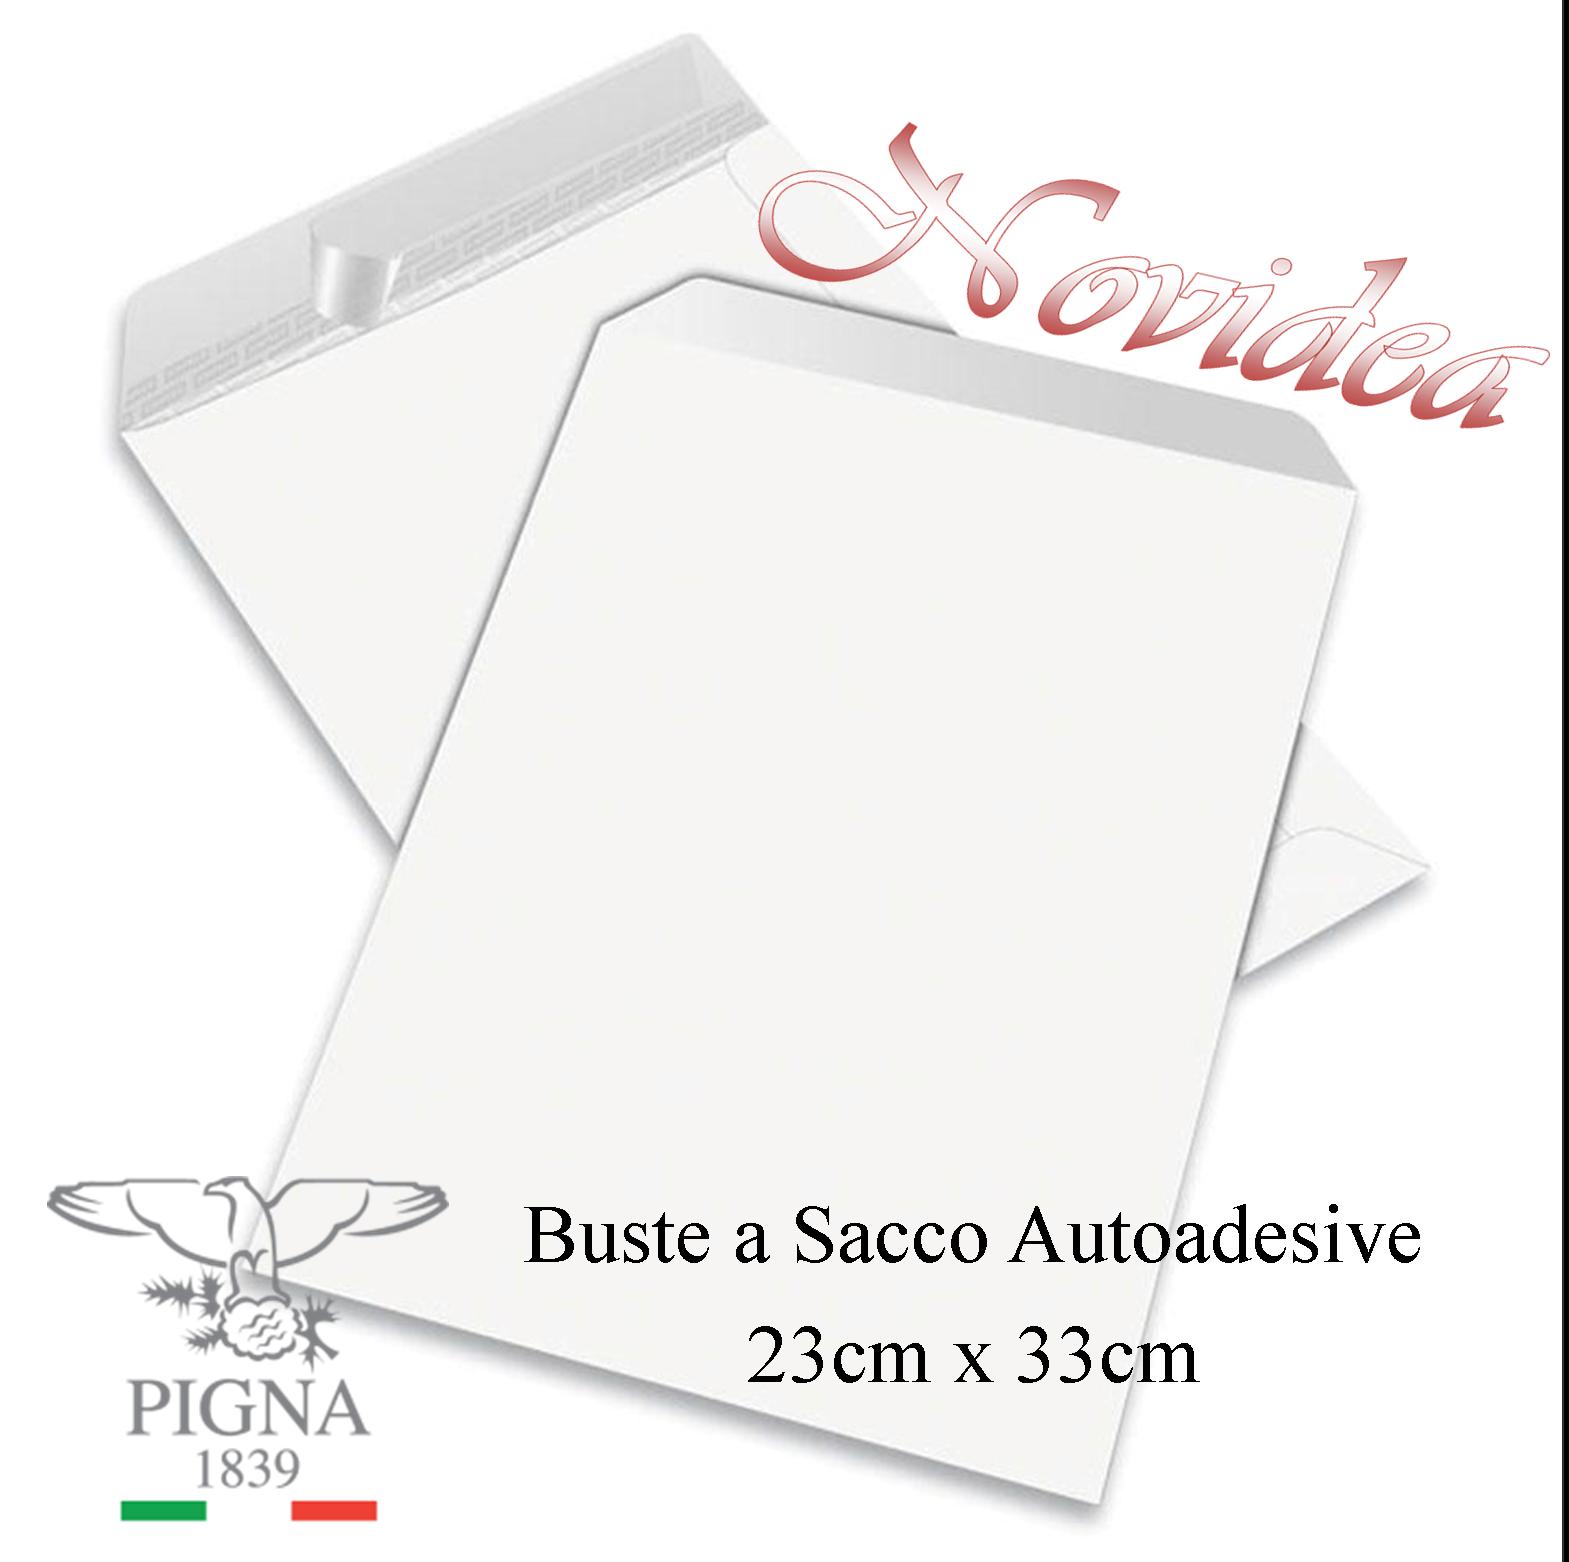 Buste a Sacco Commerciali 23x33 230x330 Bianche Pigna 80Gr Autoadesive